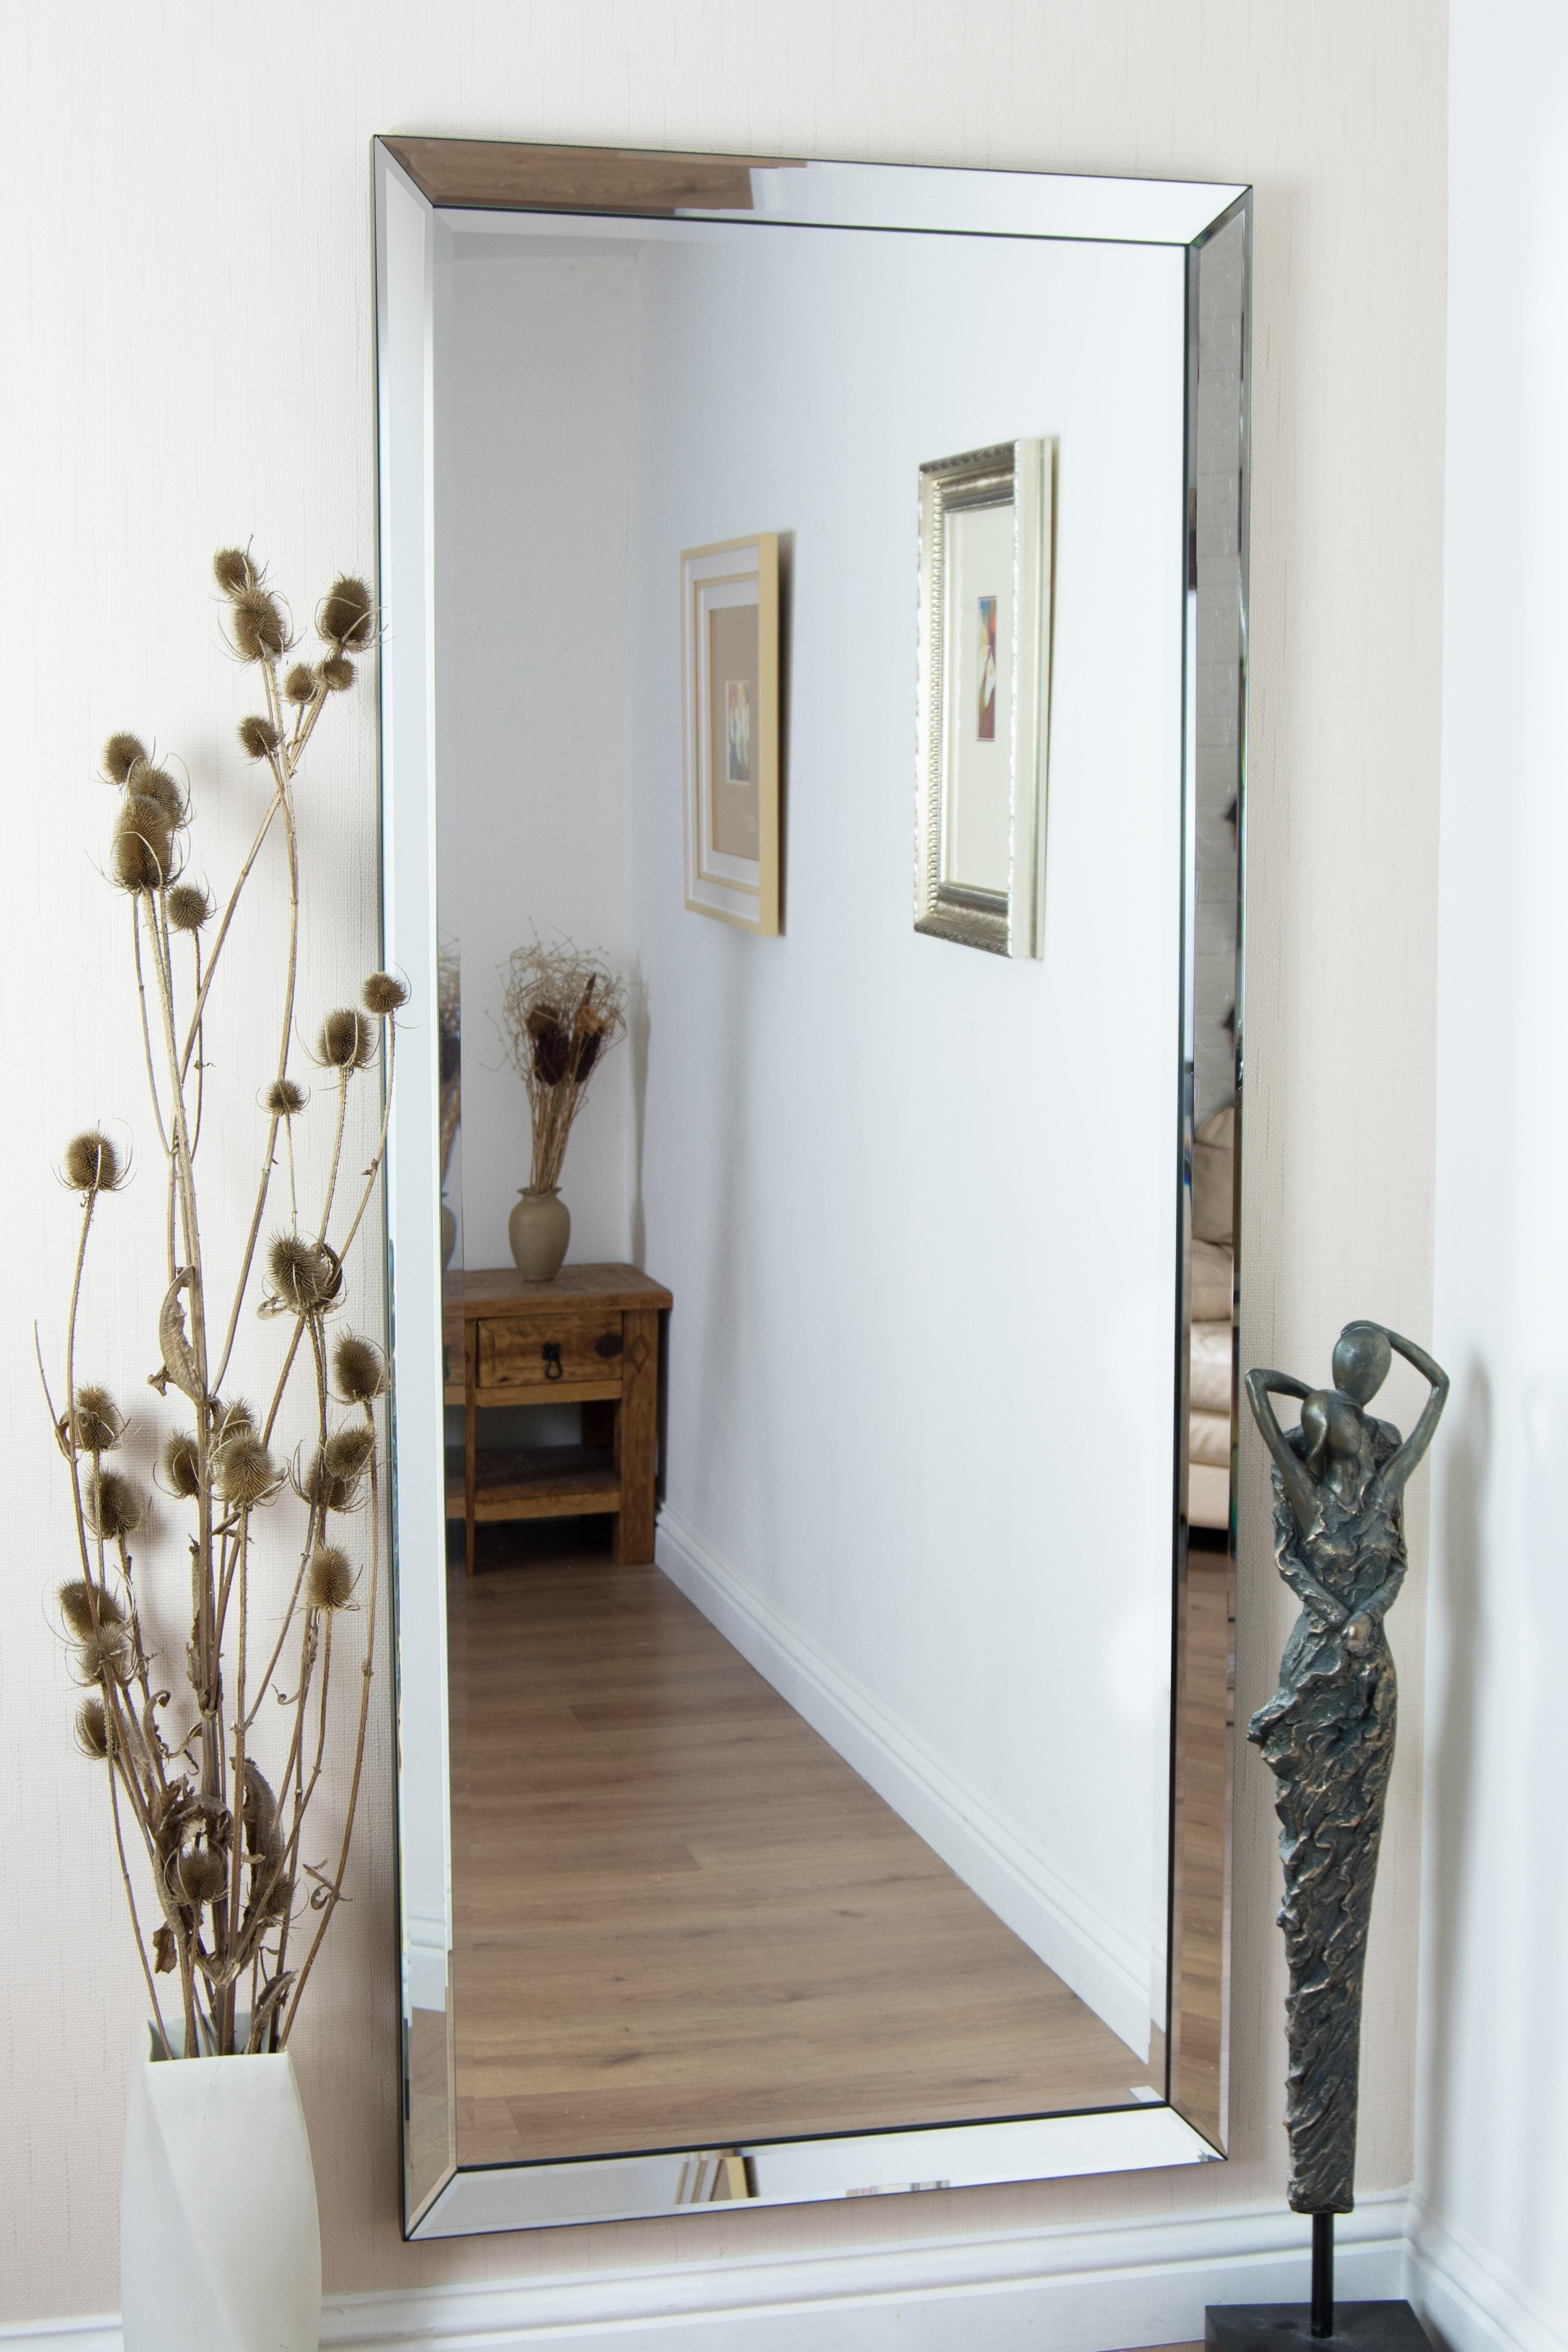 20 Fotos Grossen Billig Wand Spiegel Spiegel Spiegel Pinterest